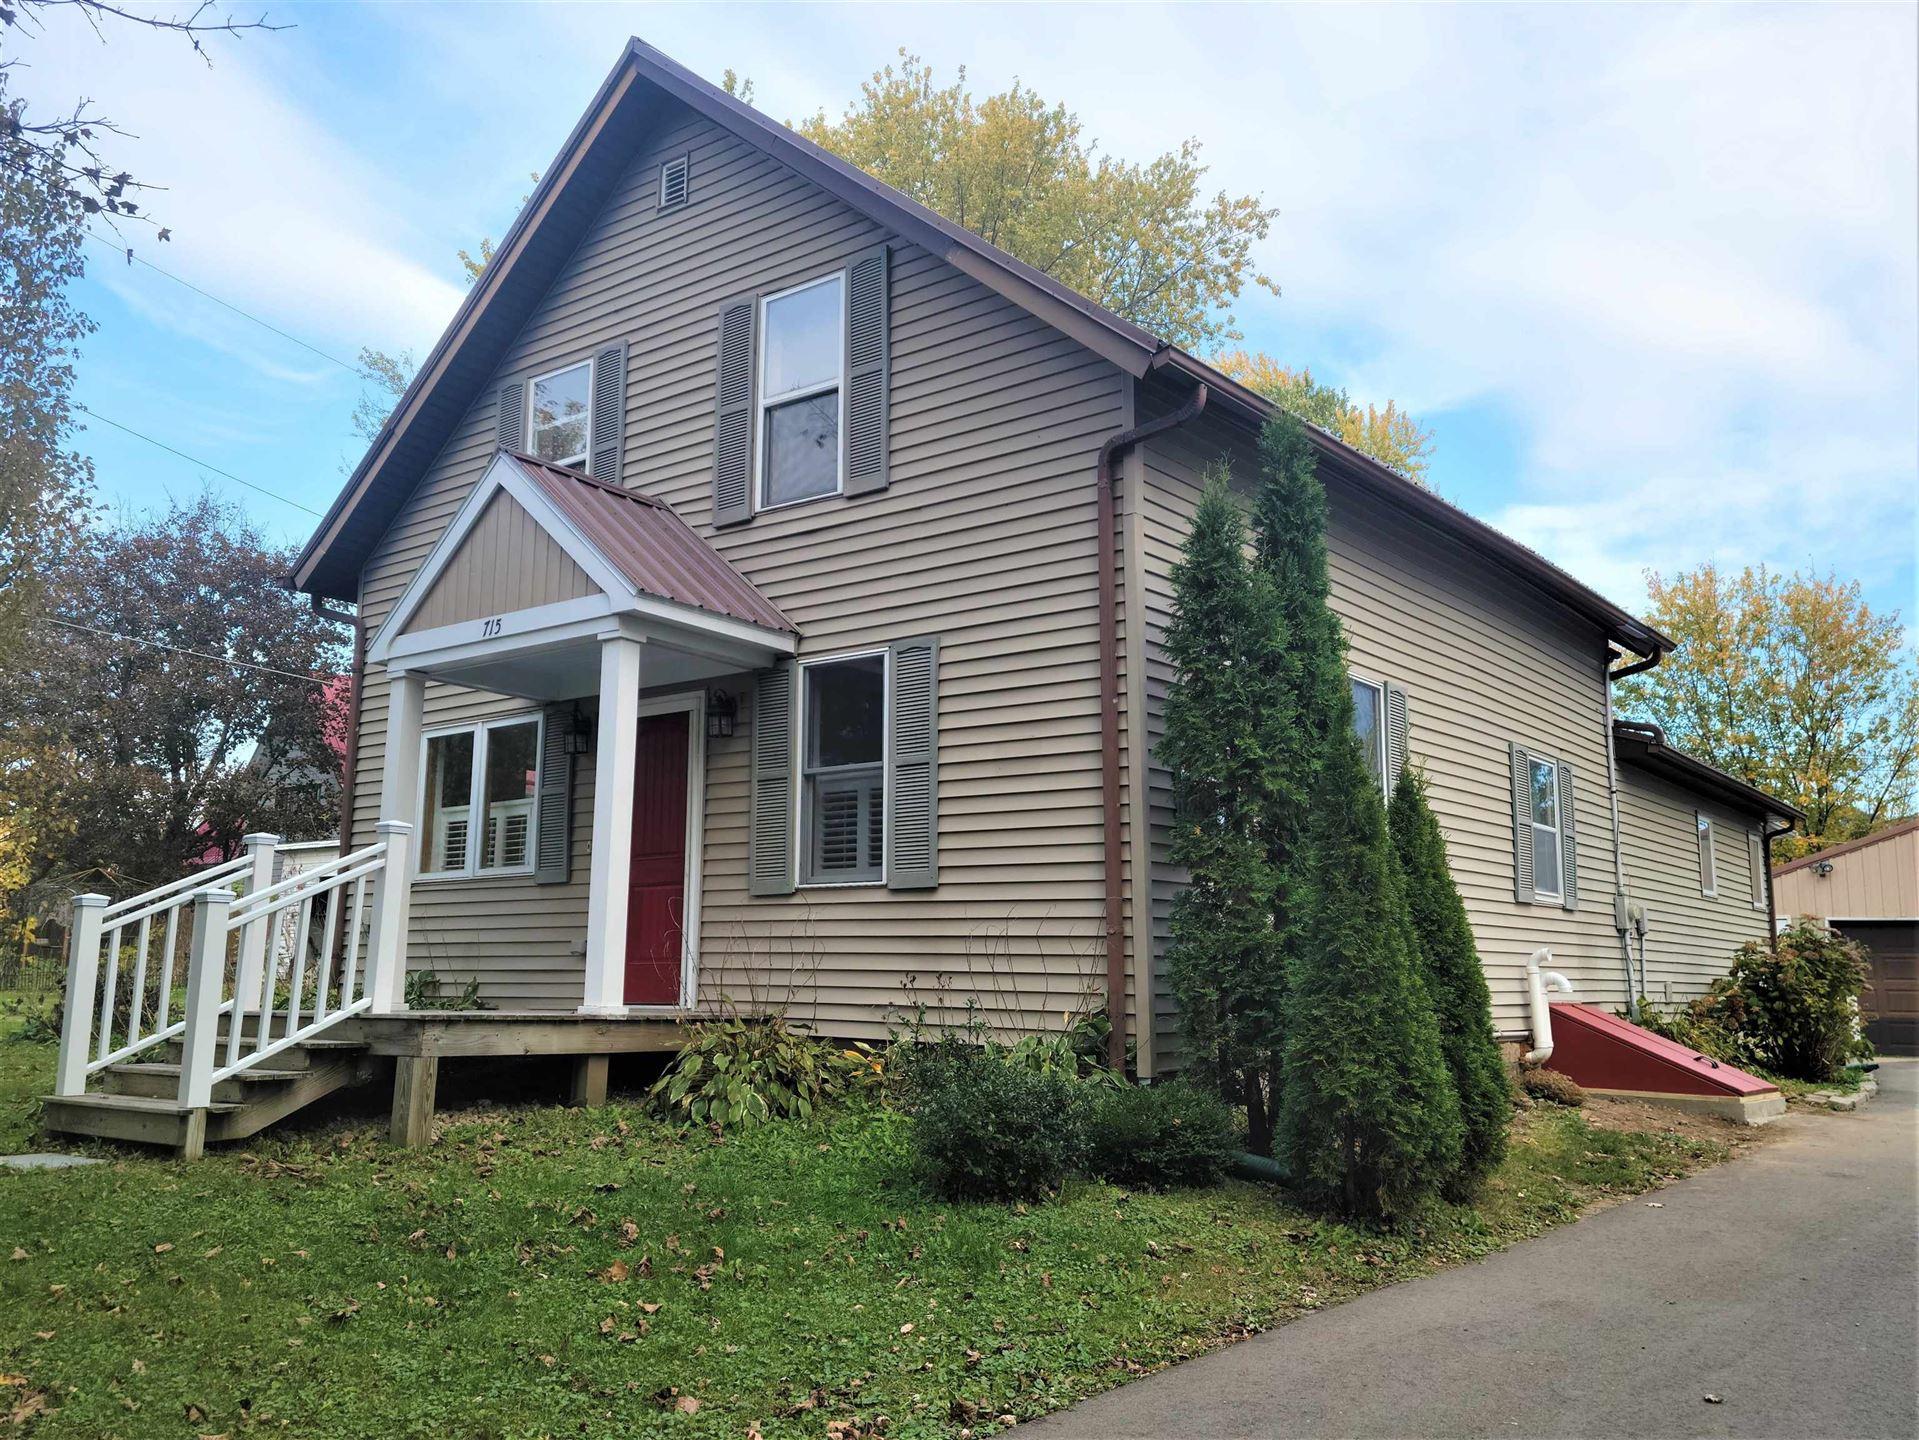 715 Garfield Ave, Viroqua, WI 54665 - #: 1909838